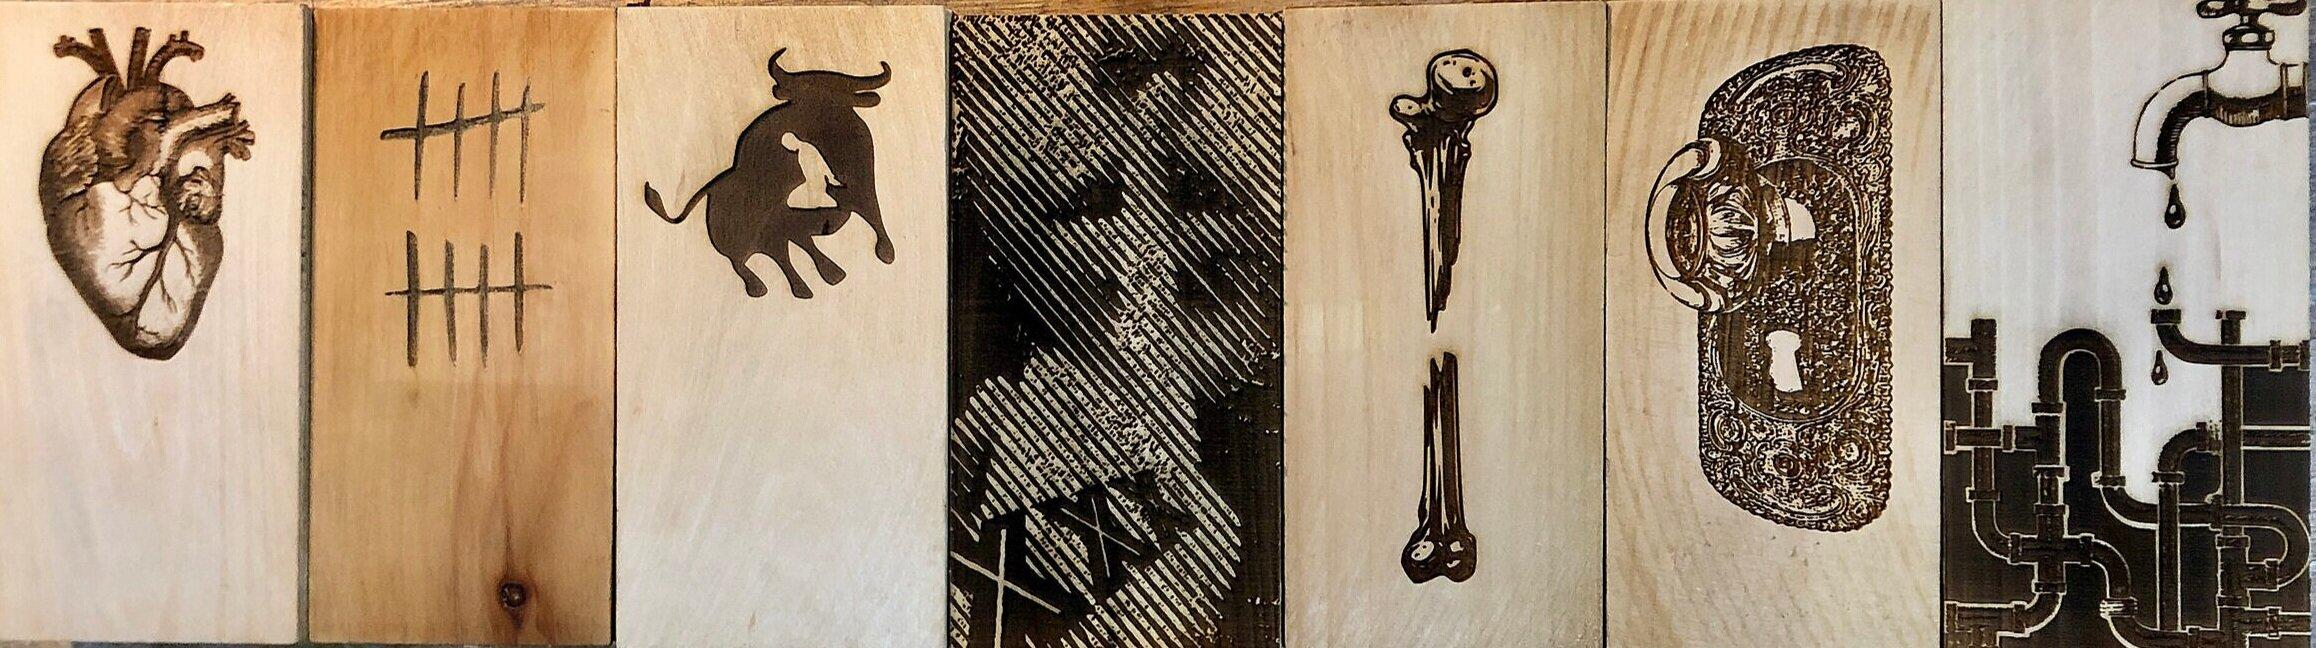 woodenboxes.jpg